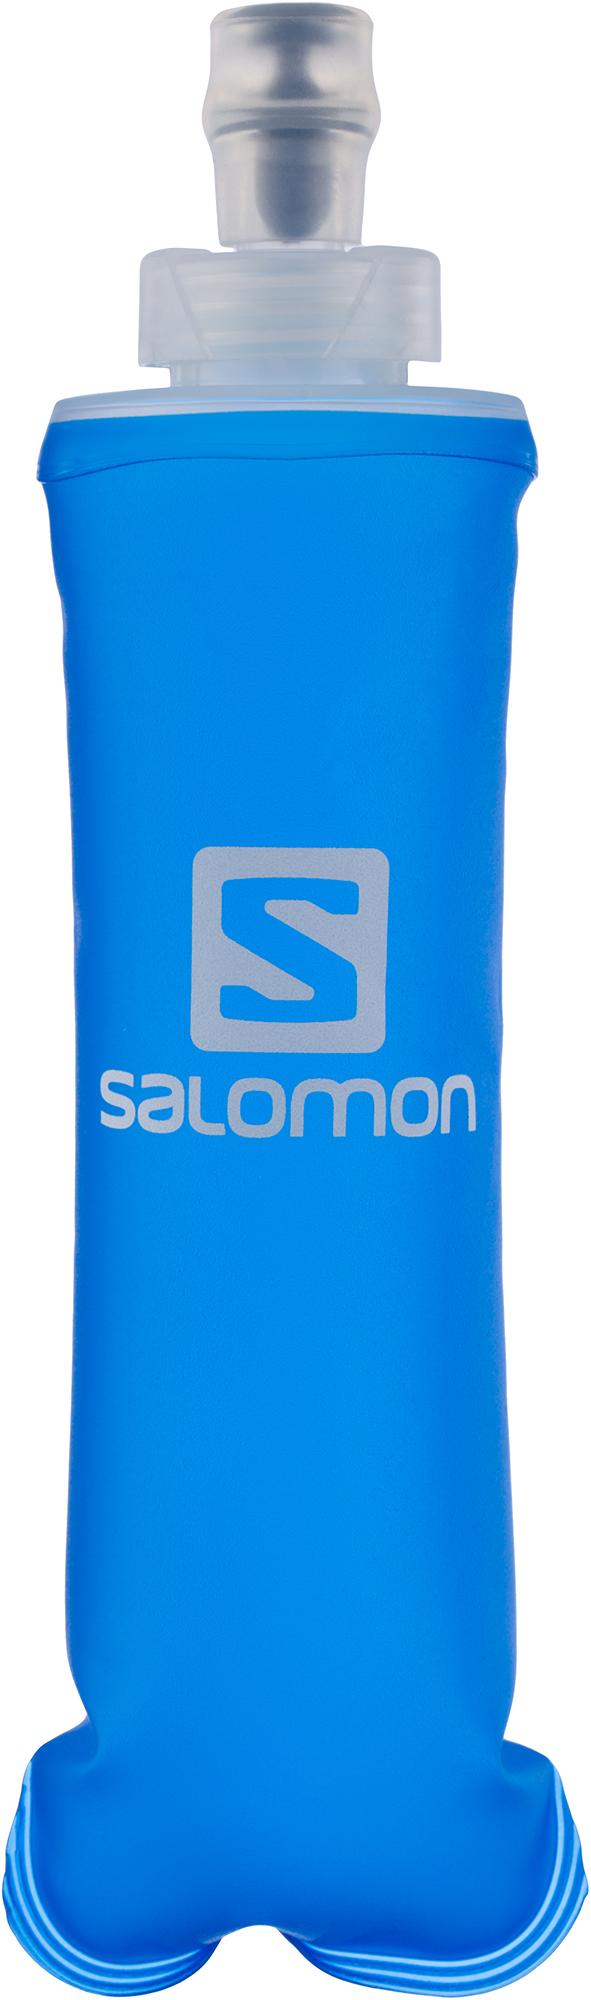 Salomon Фляга